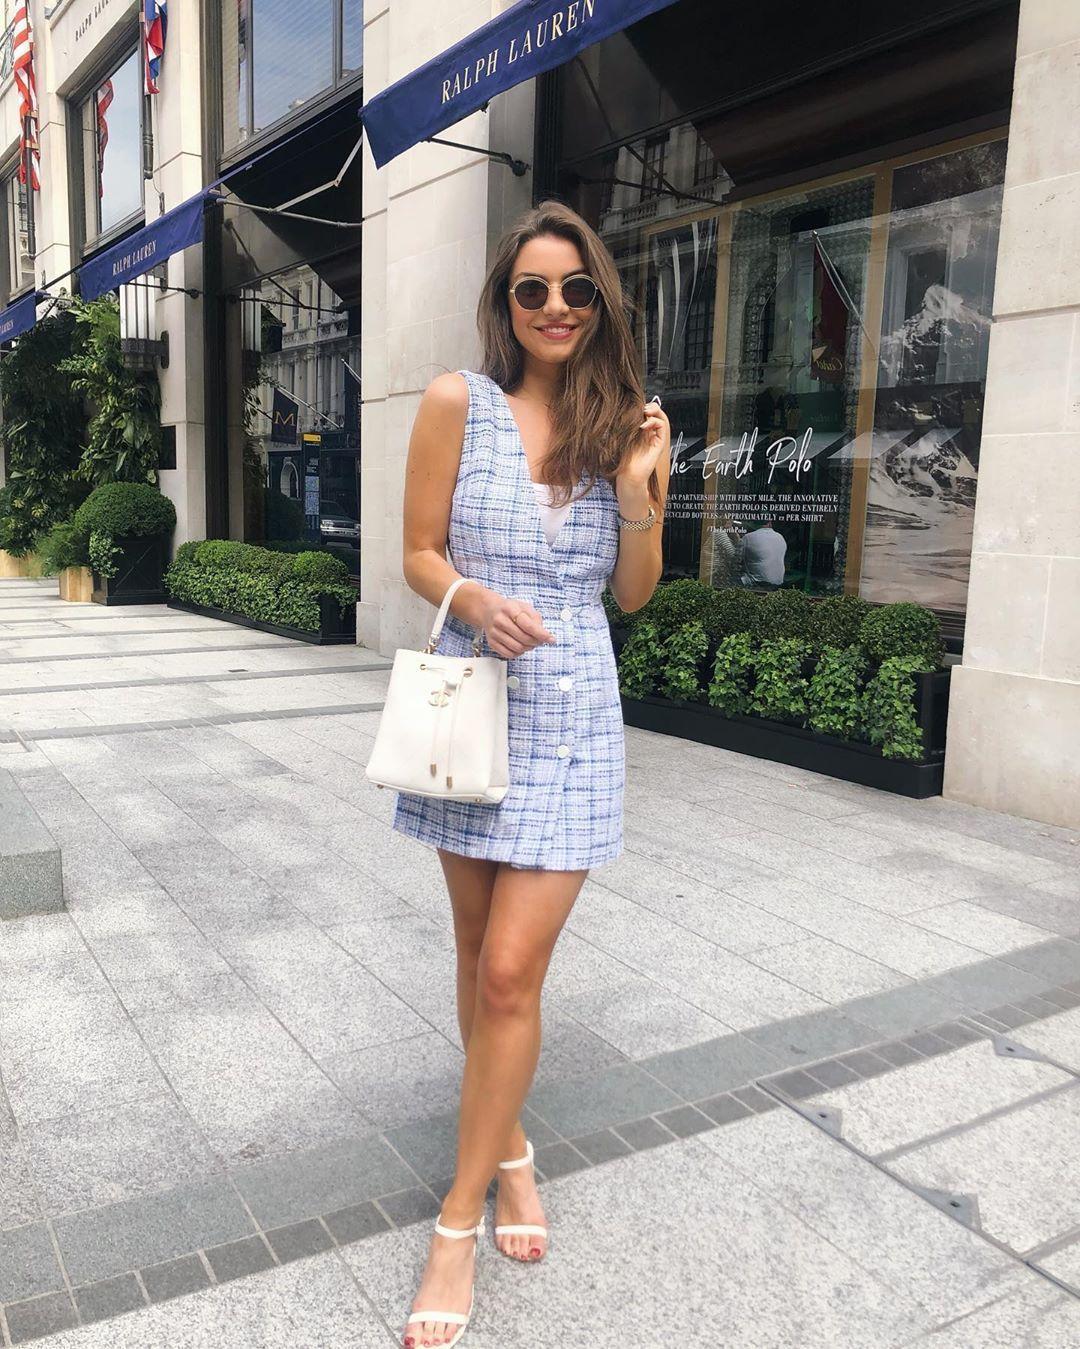 Dress, $35 at Zara – Wheretoget